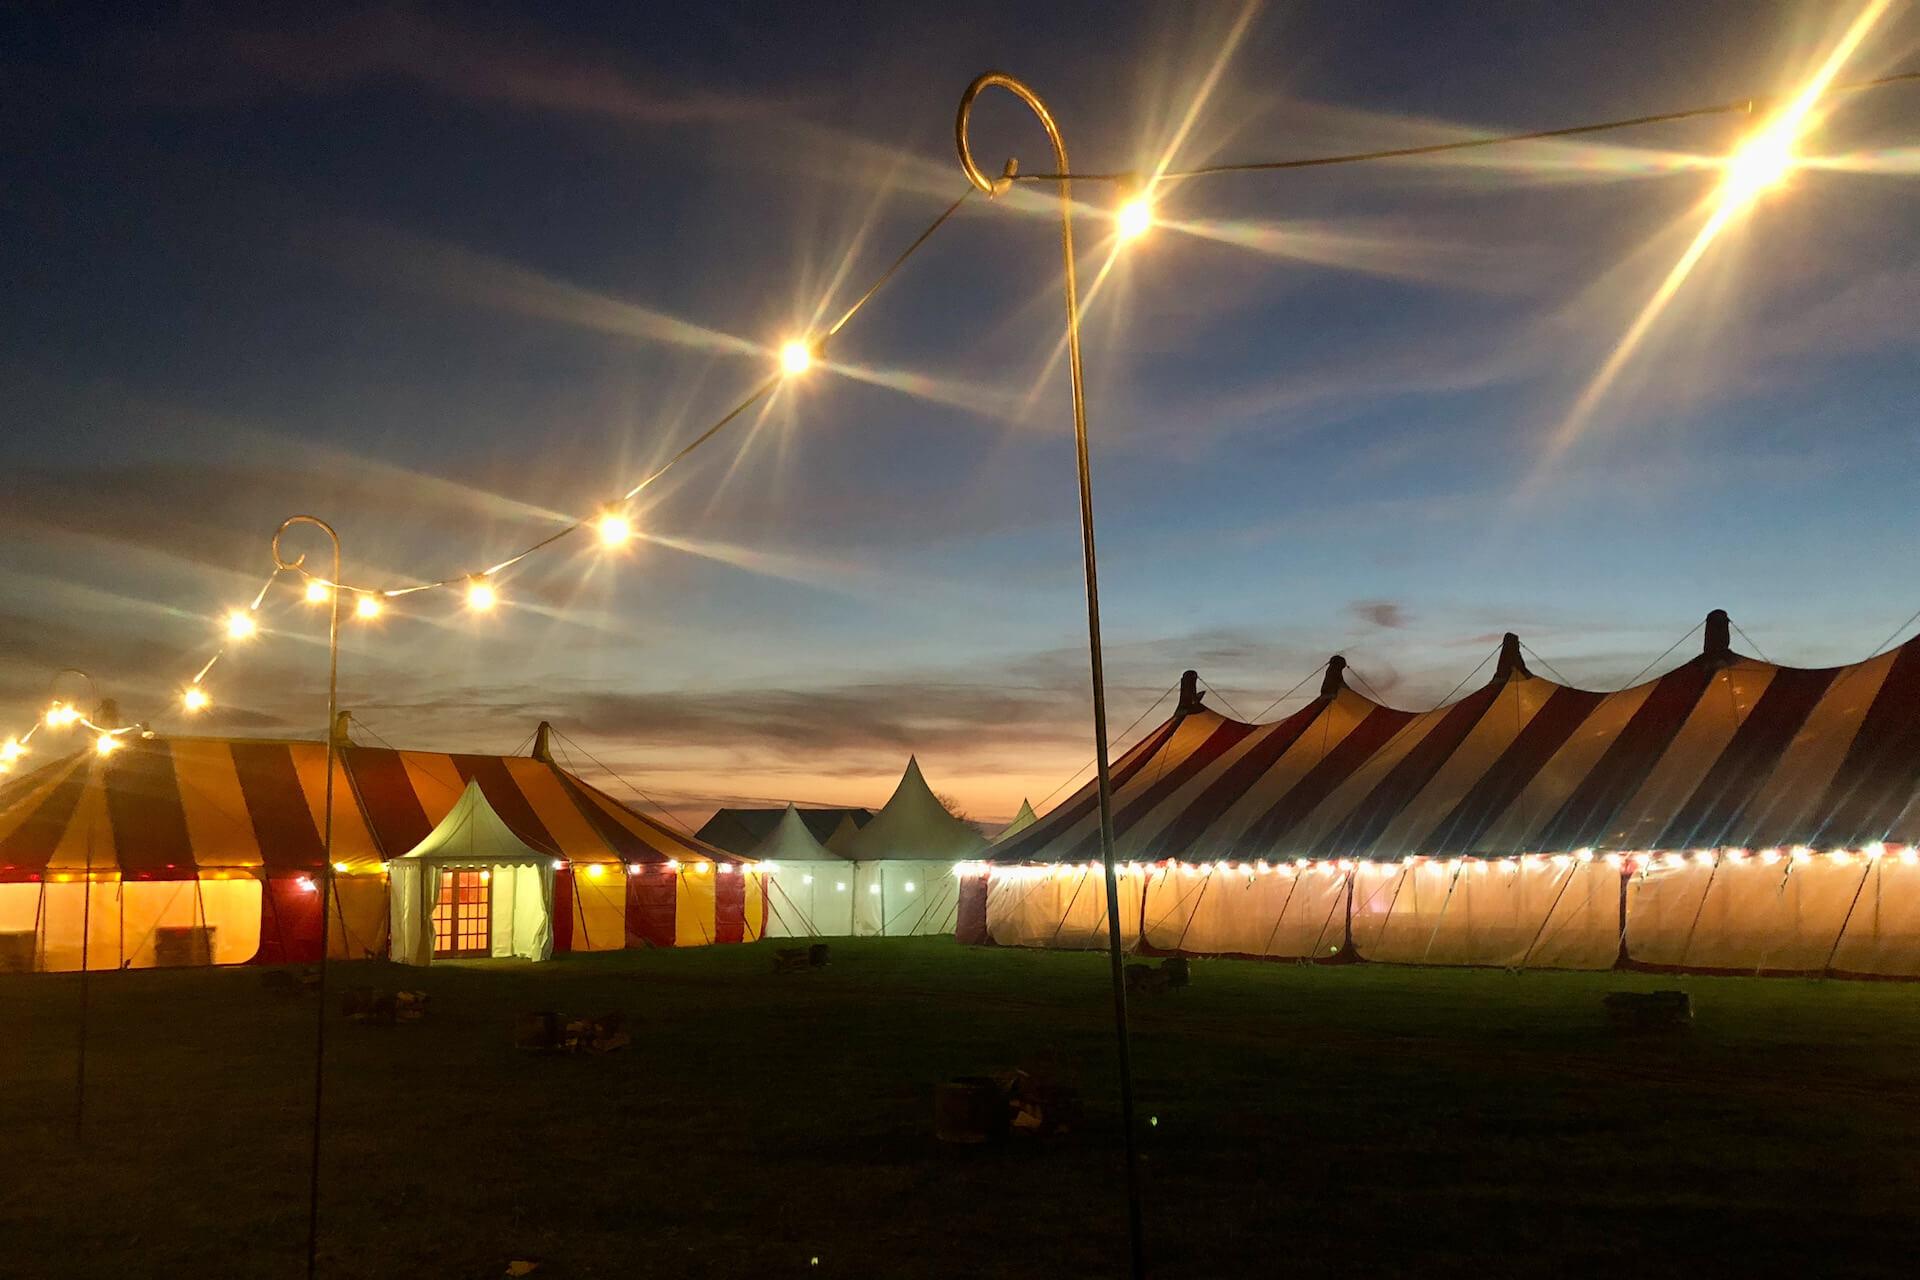 Festoon lighting on tall shepherd crooks for pathway lighting at a wedding